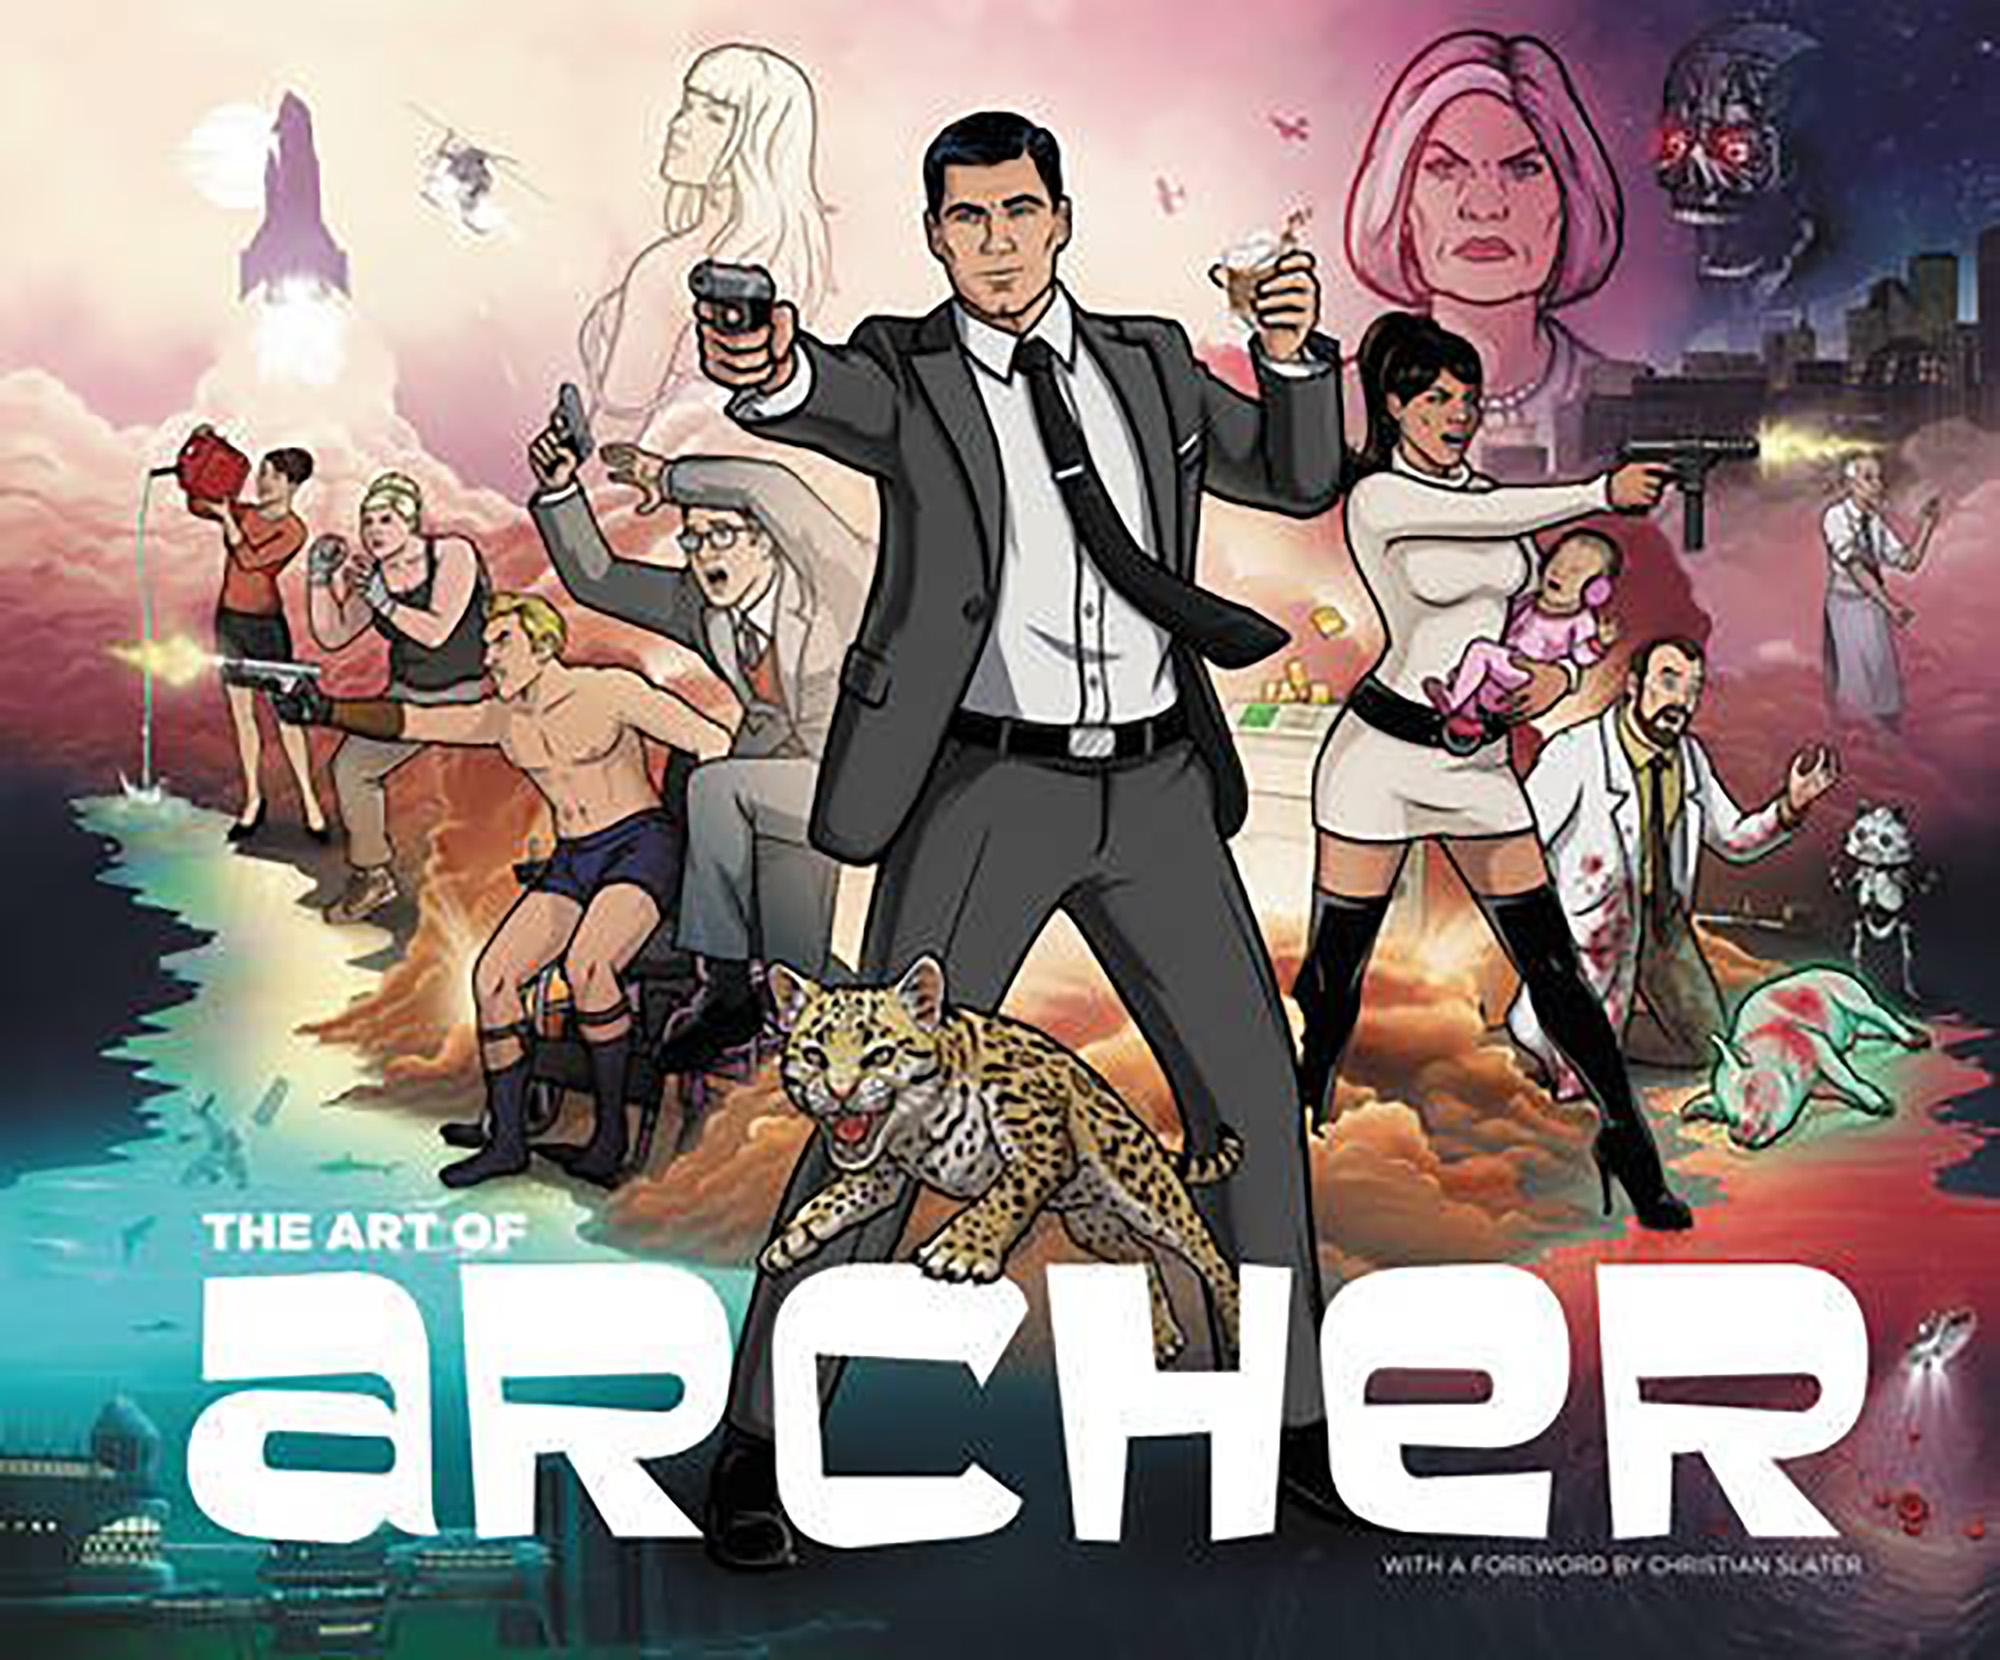 Neal Holman: The Art of Archer